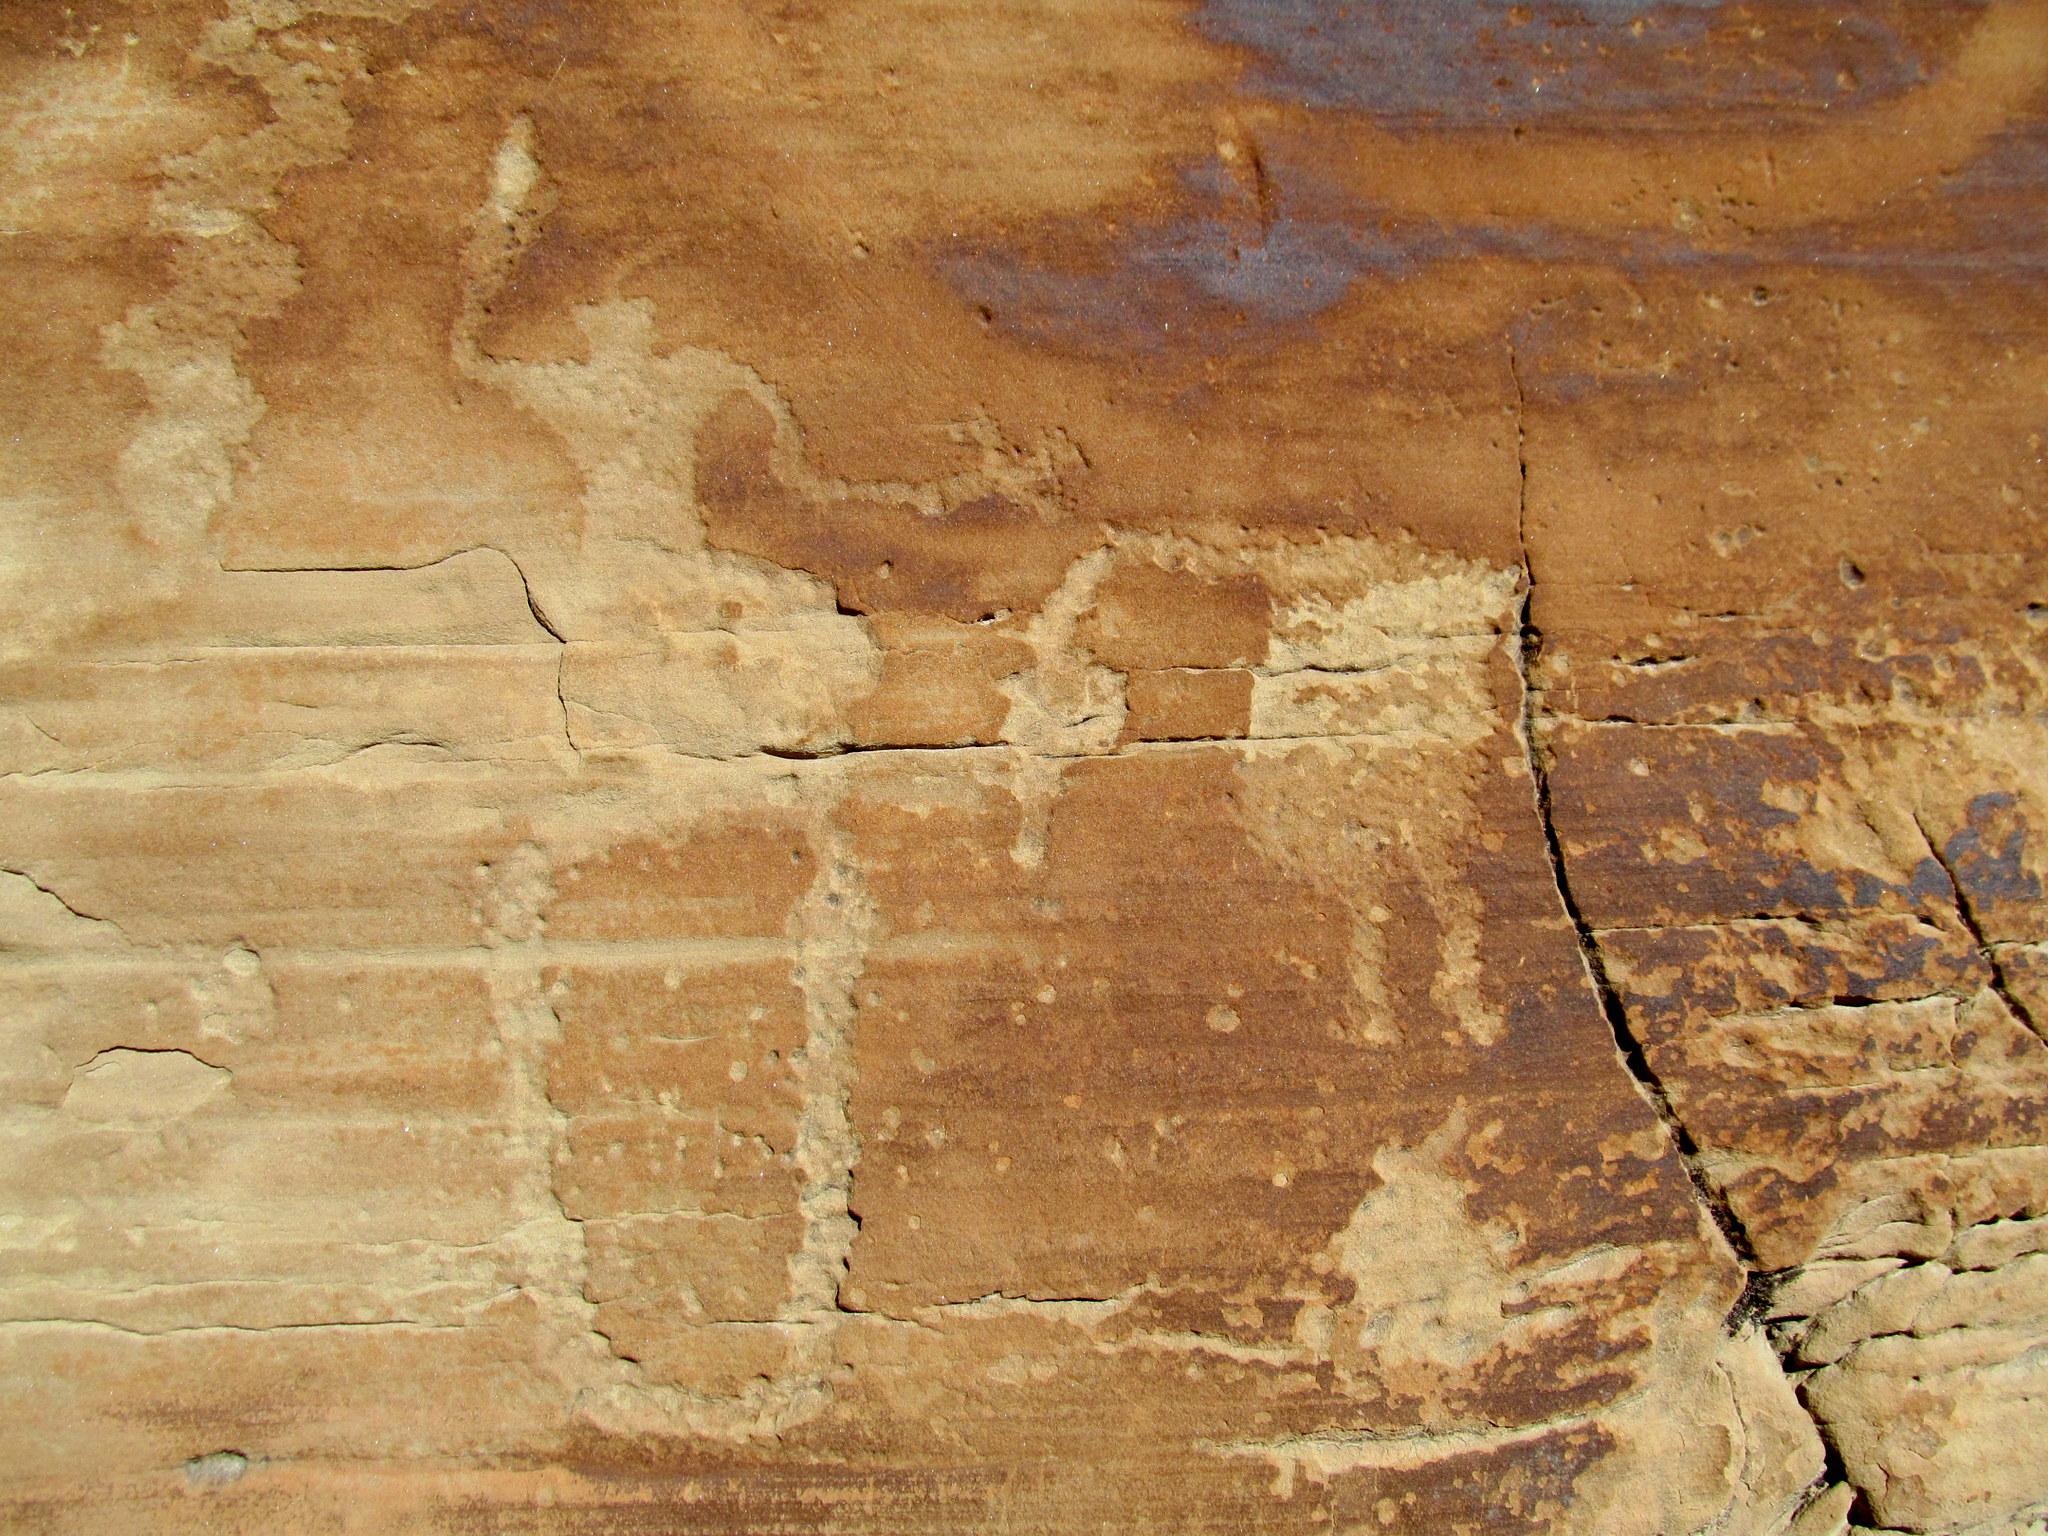 Photo: Possible headhunter petroglyph